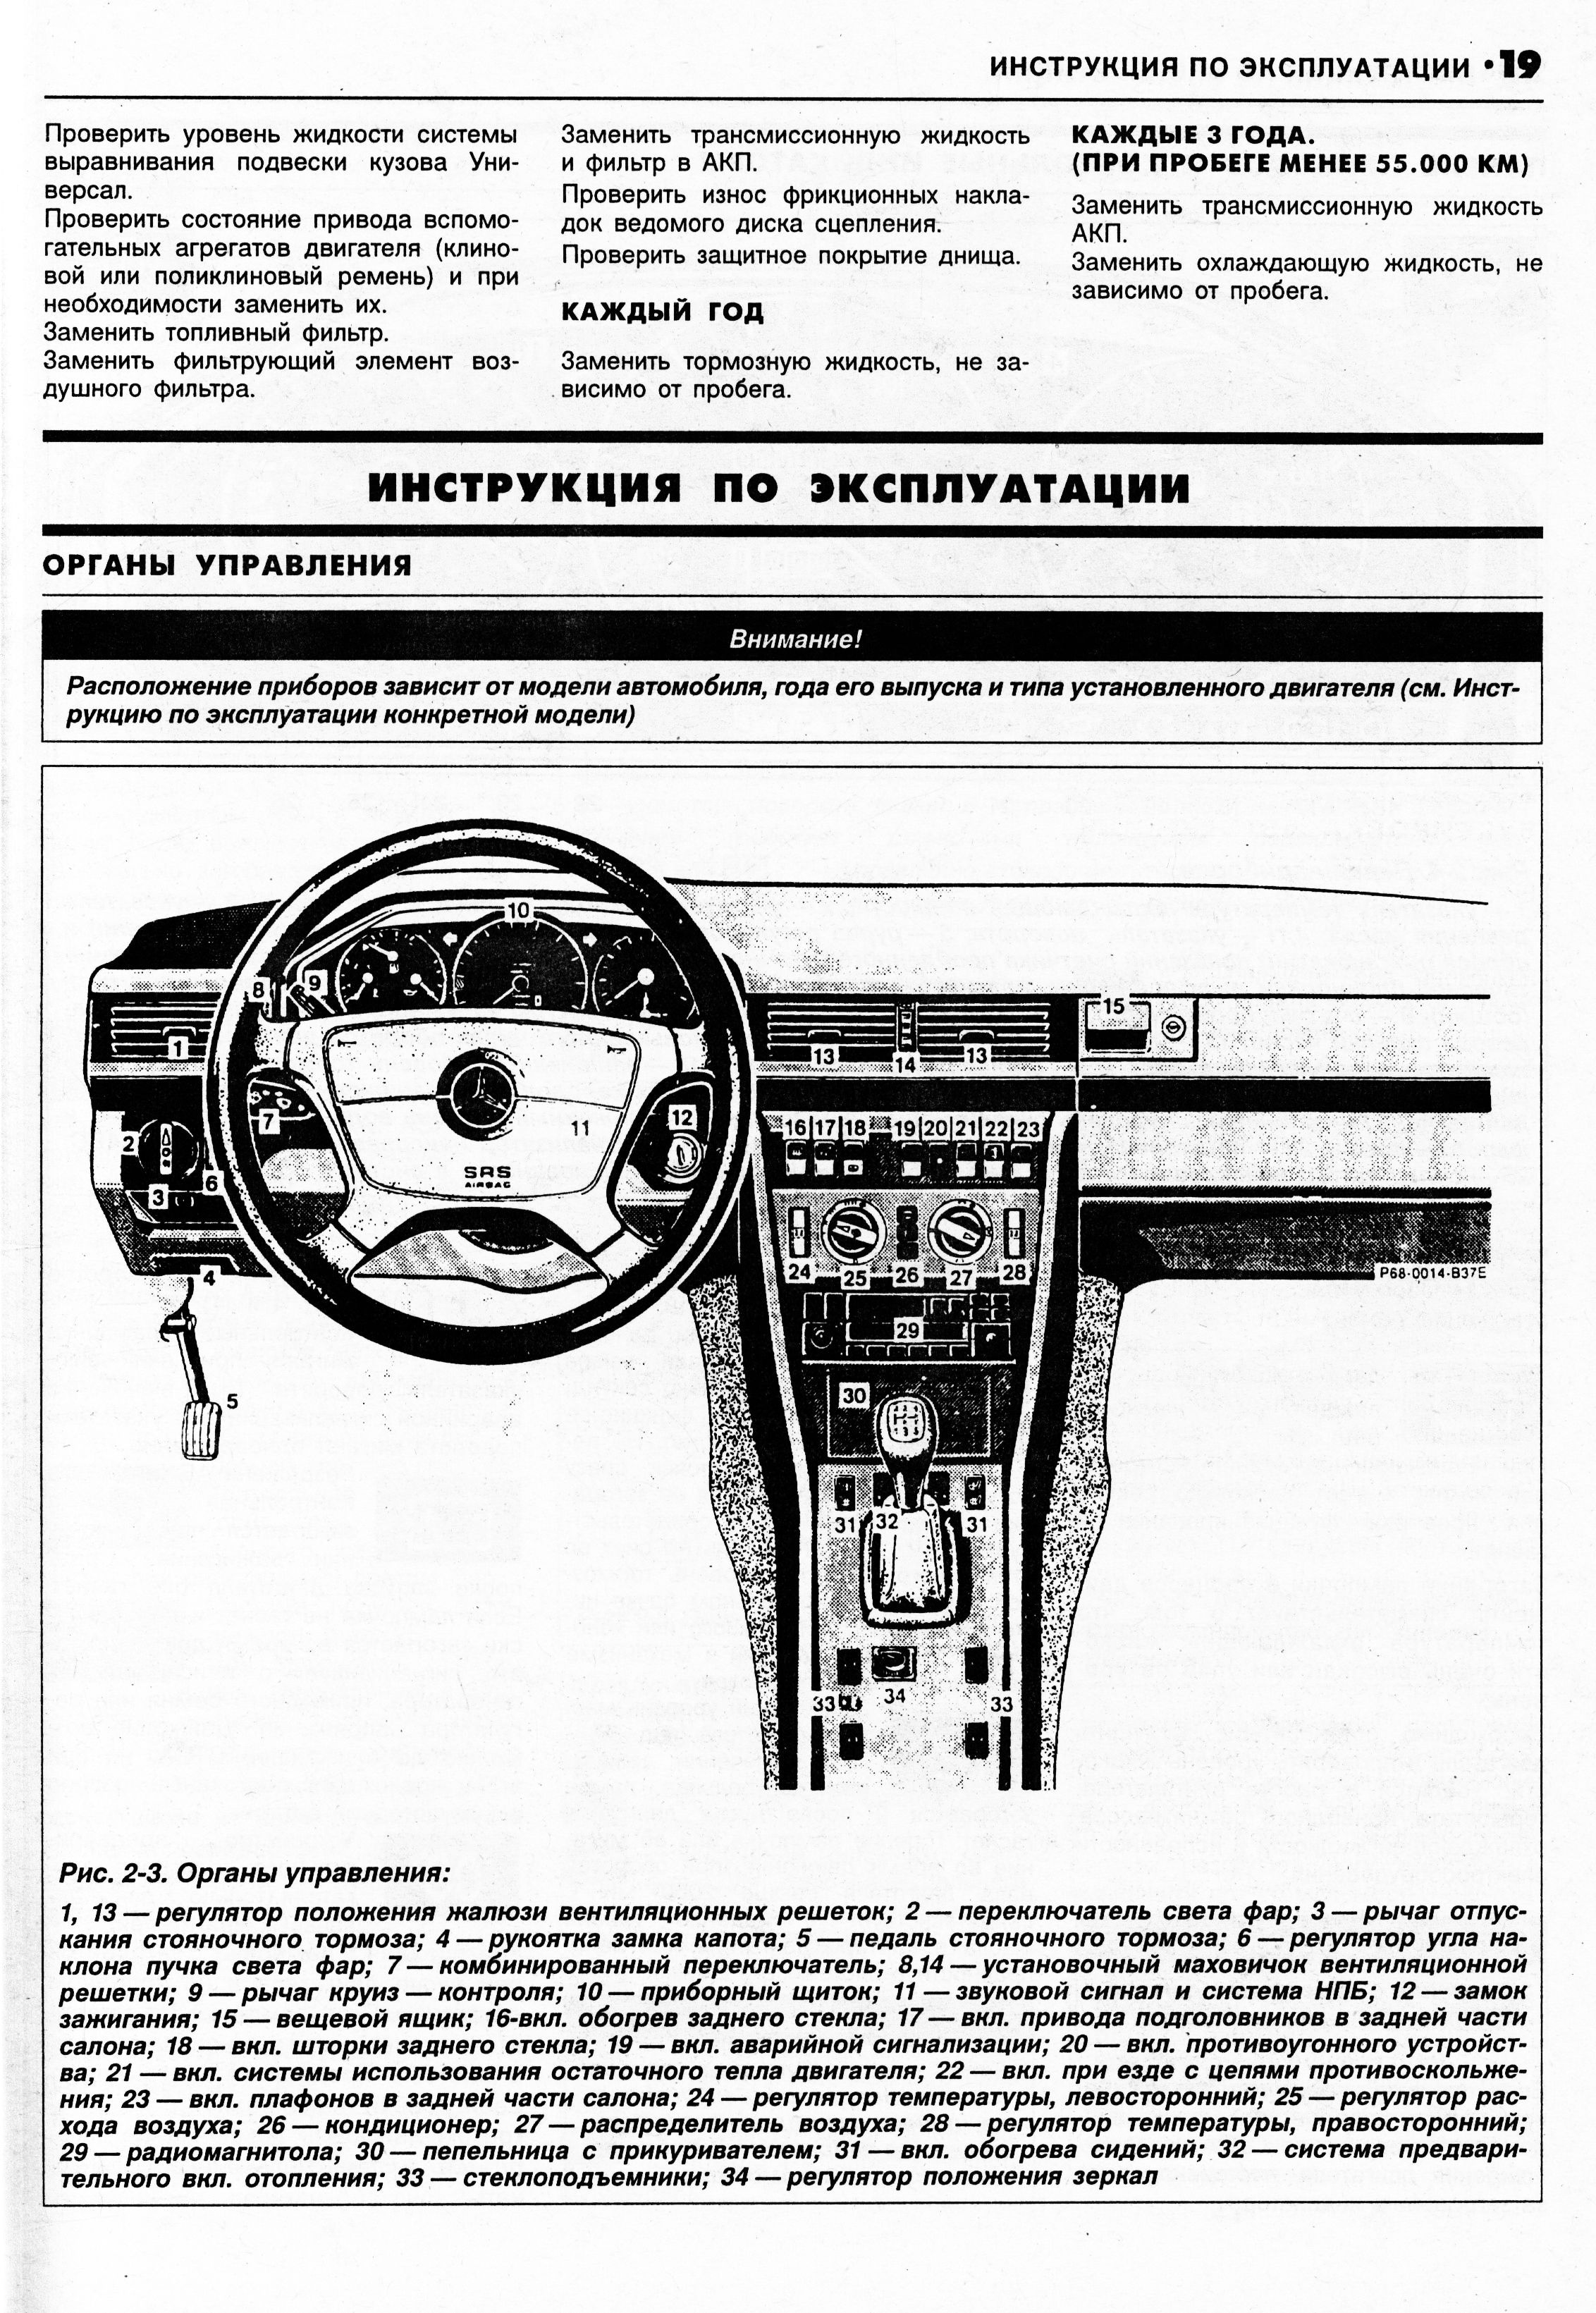 man l2000 технические характеристики кабины